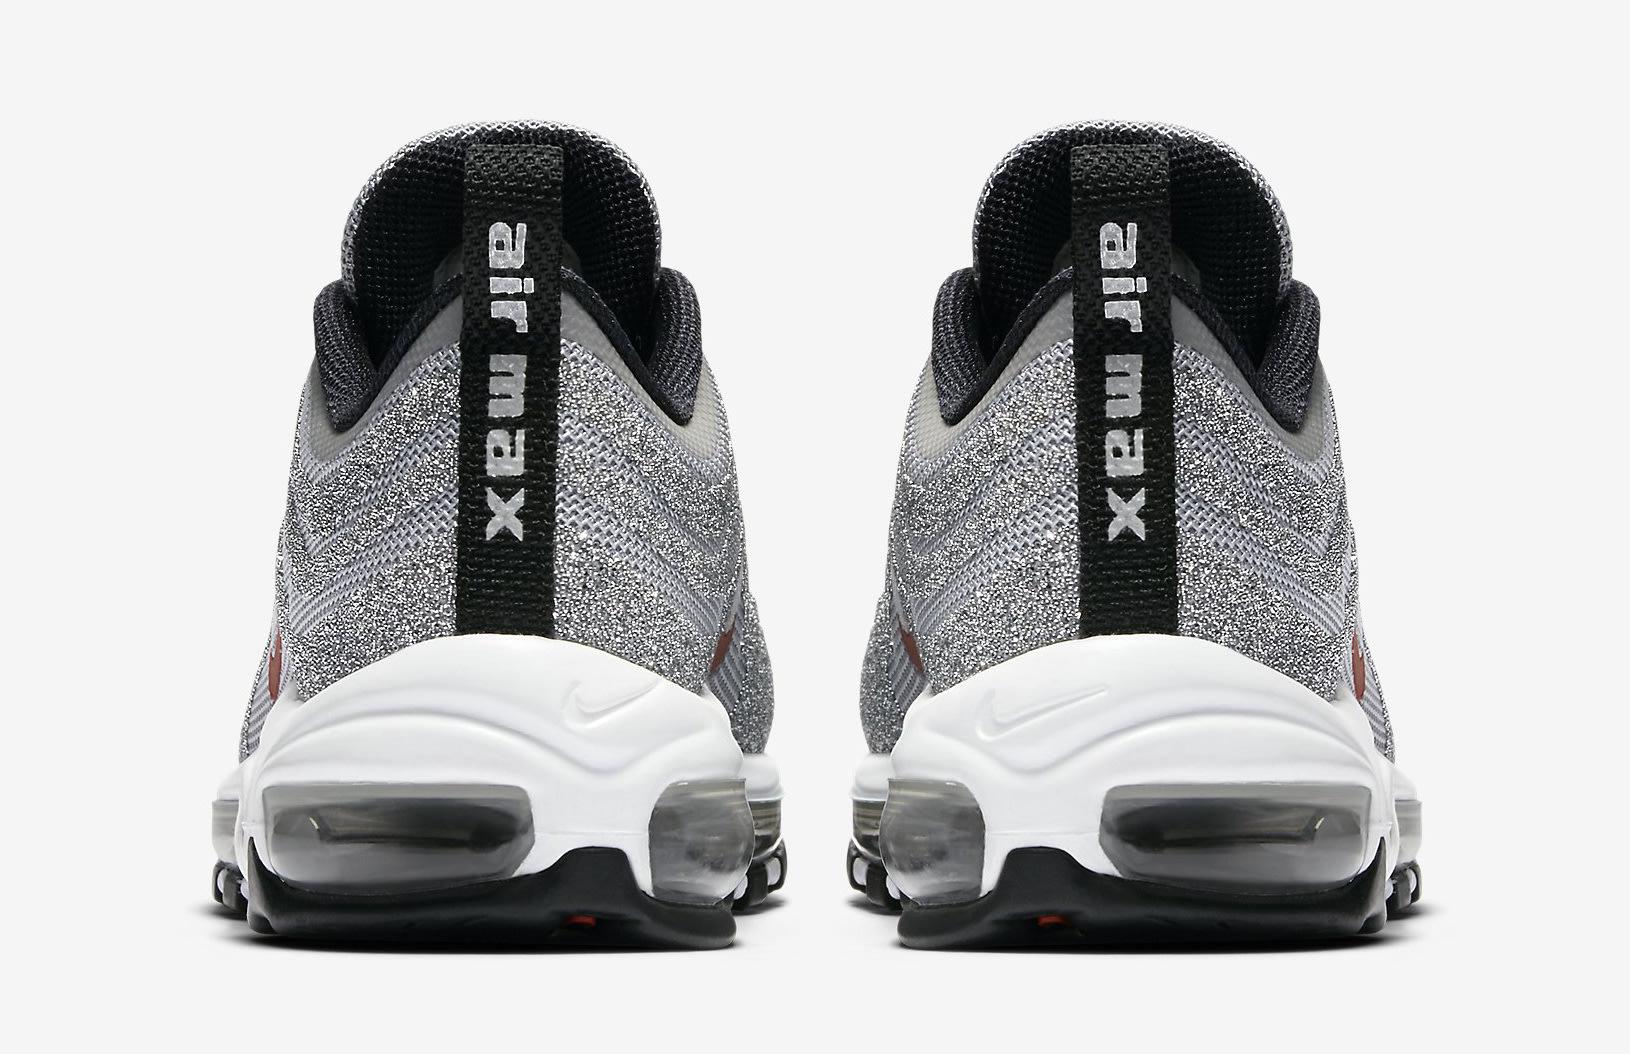 Crystal Nike Air Max 97 927508-002 Heel